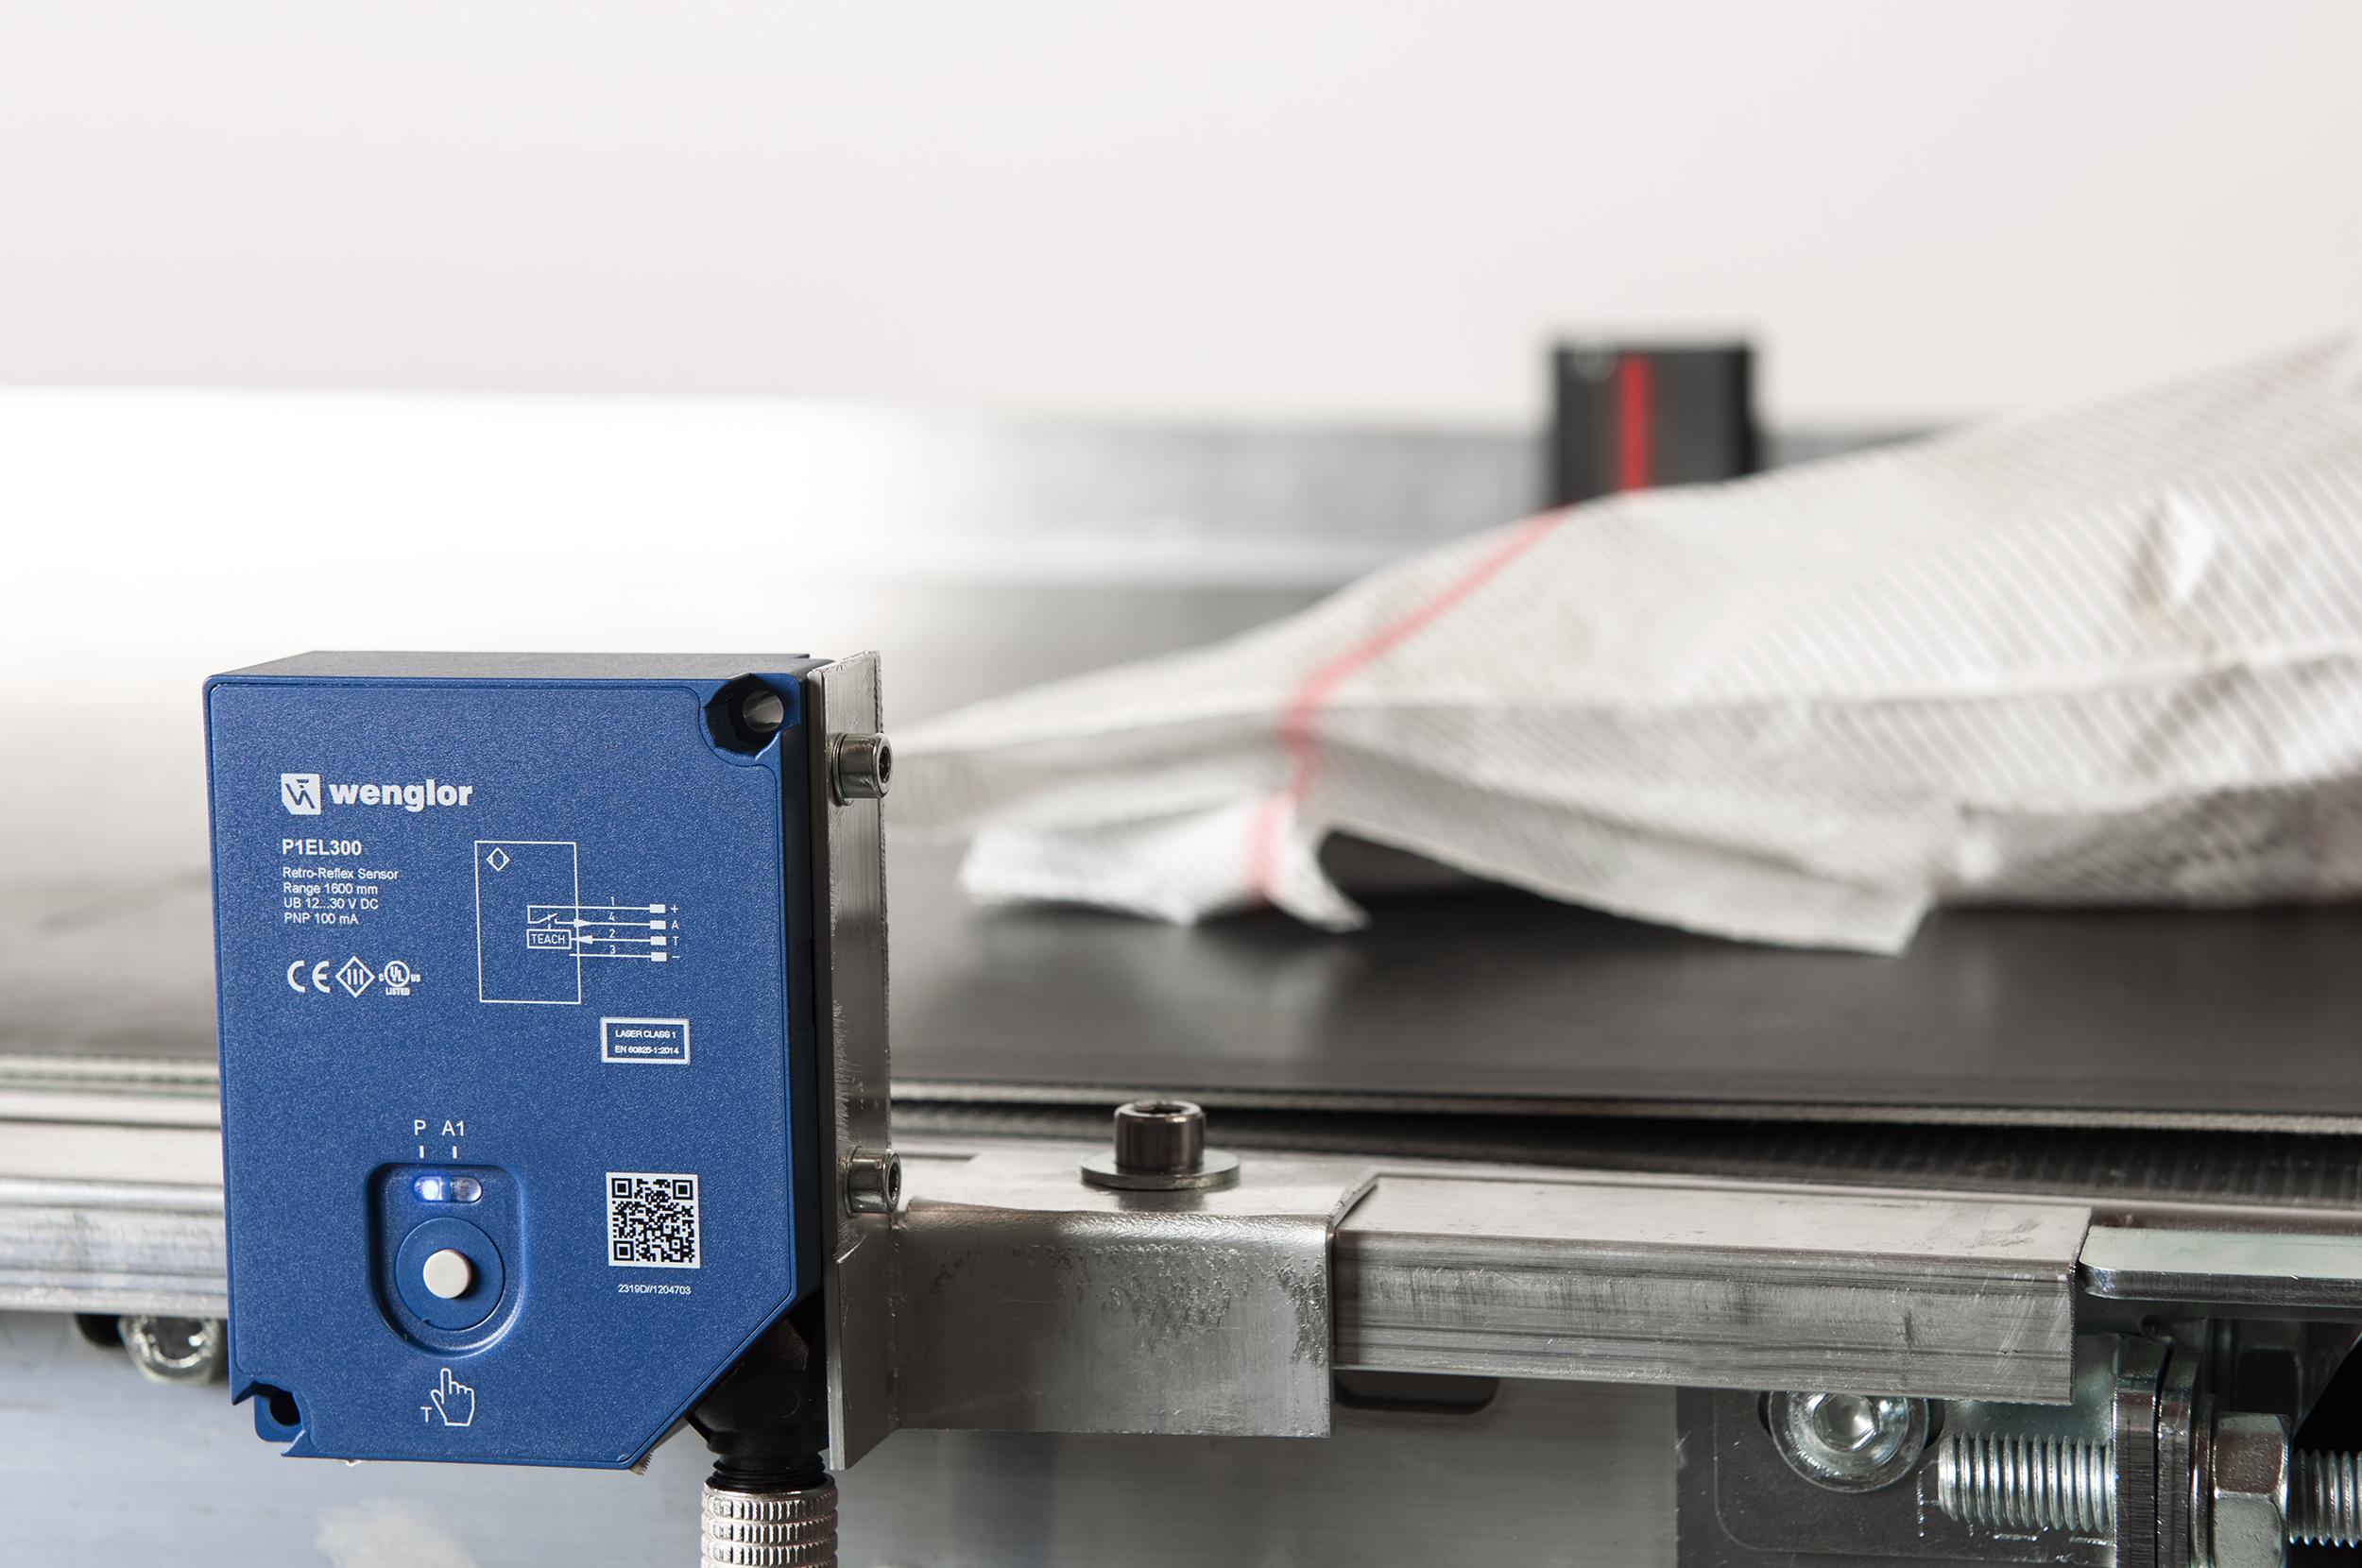 Sensori optoelettronici catarifrangenti